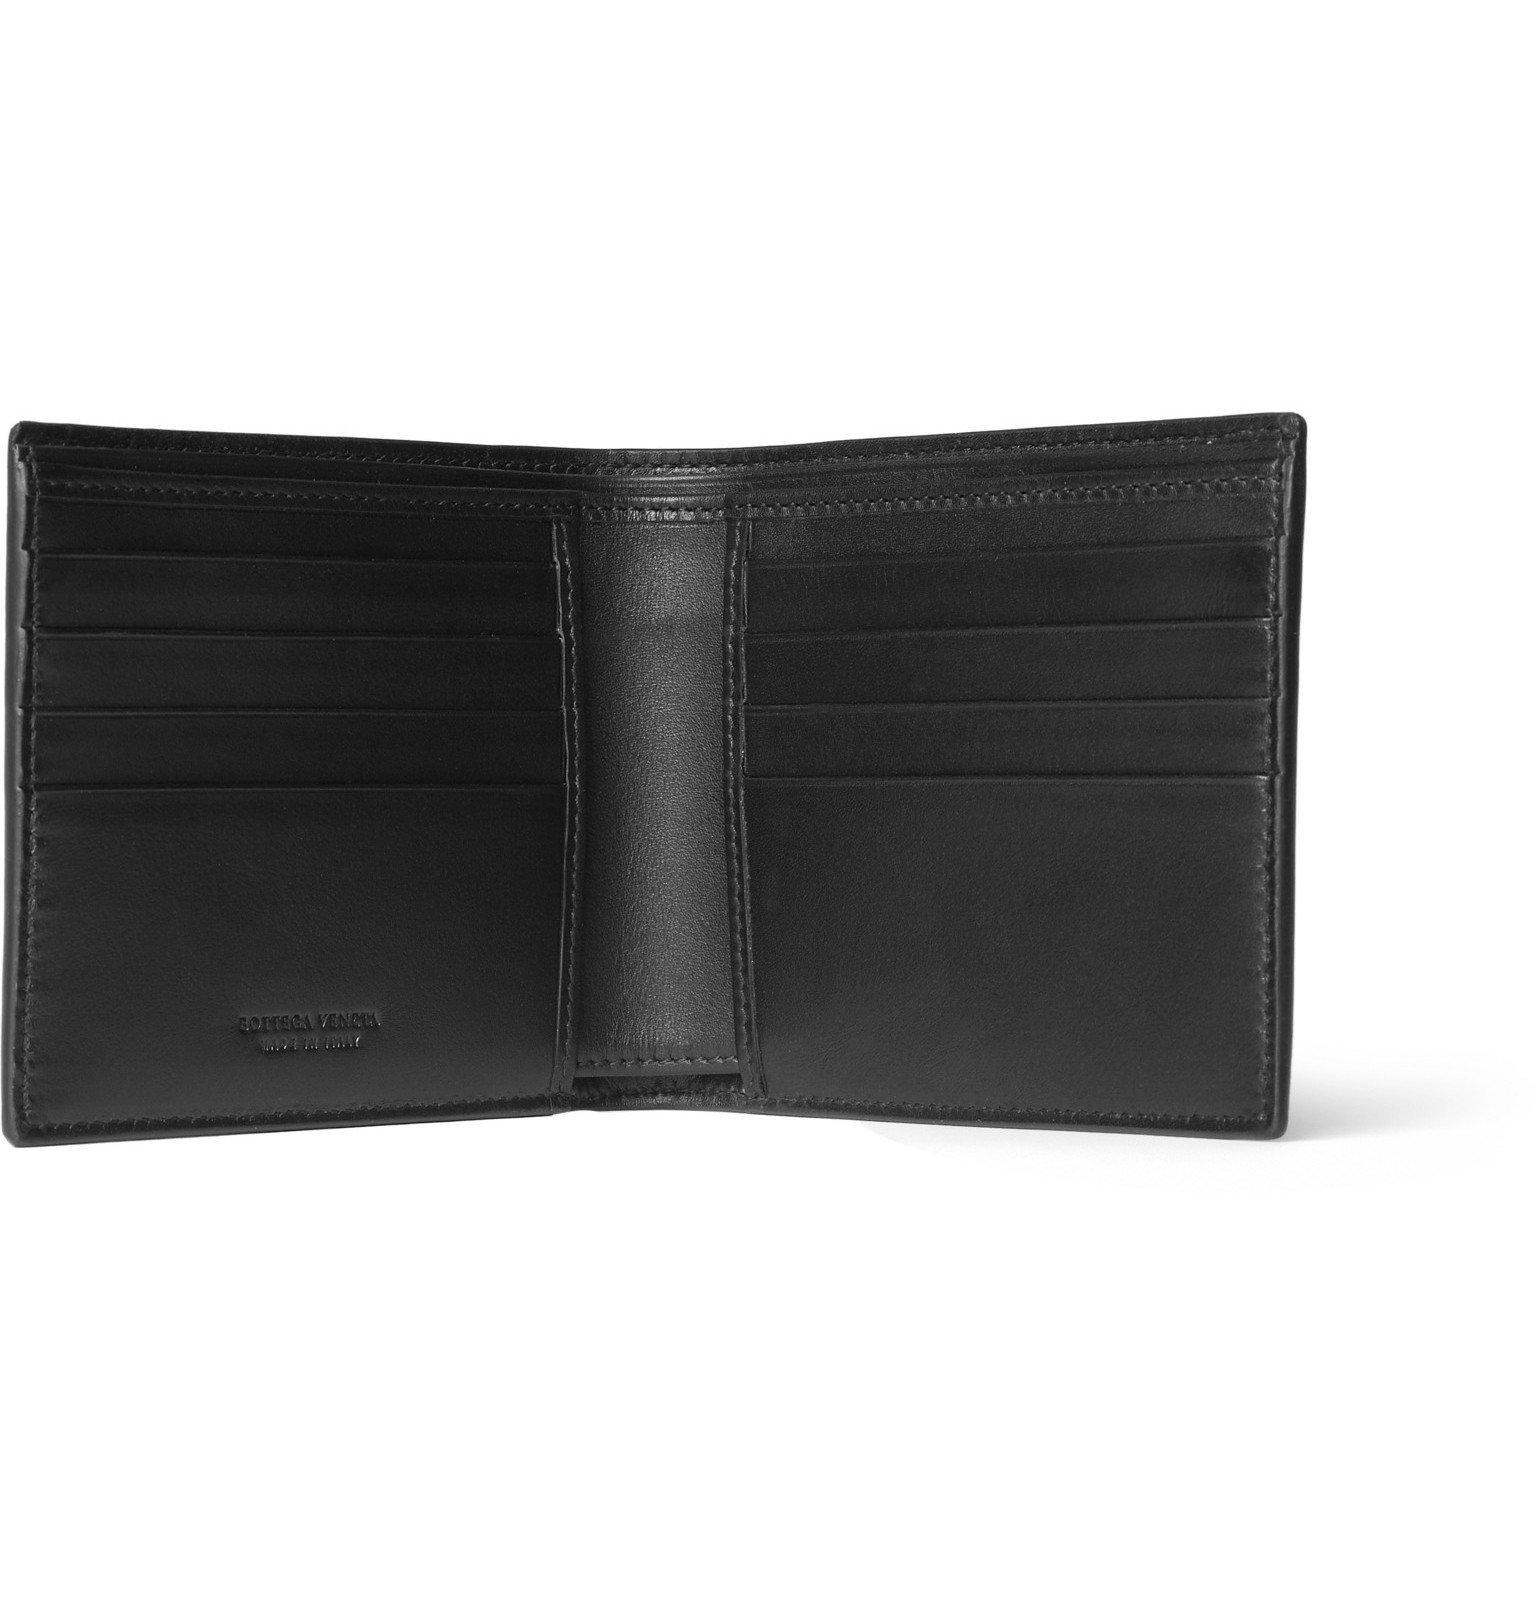 Bottega Veneta - Intrecciato Leather Billfold Wallet - Black